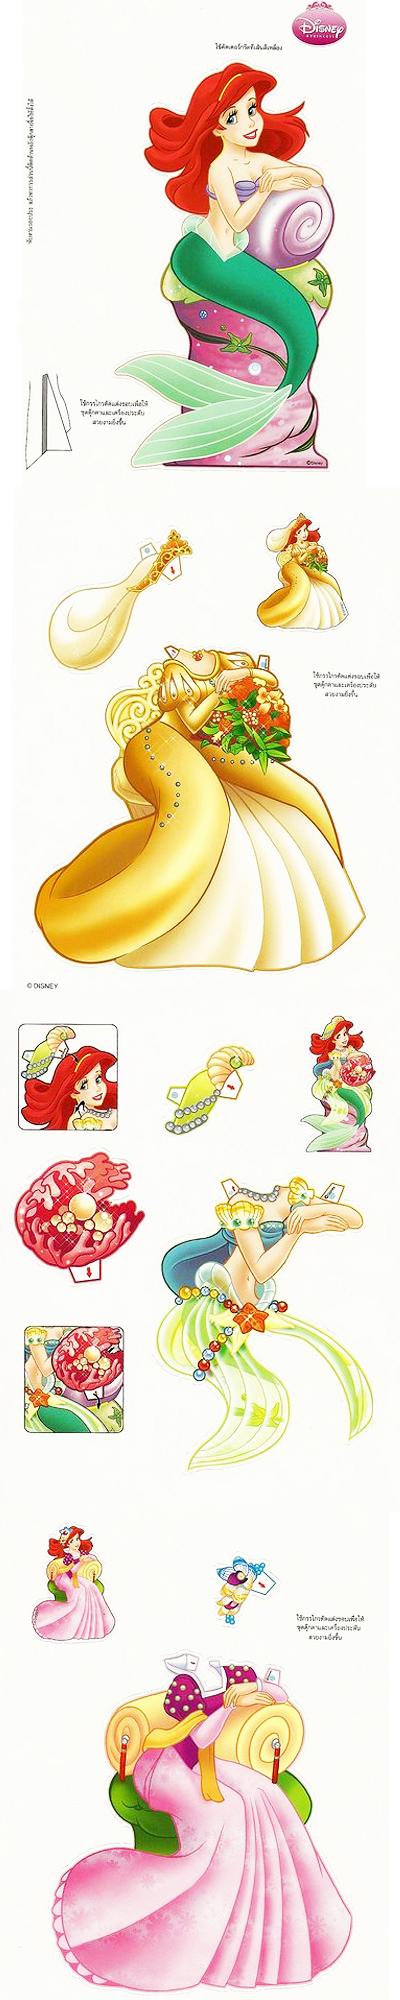 Paper Doll Disney Ariel Princess Paper Dolls Paper Dolls Paper Dolls Printable